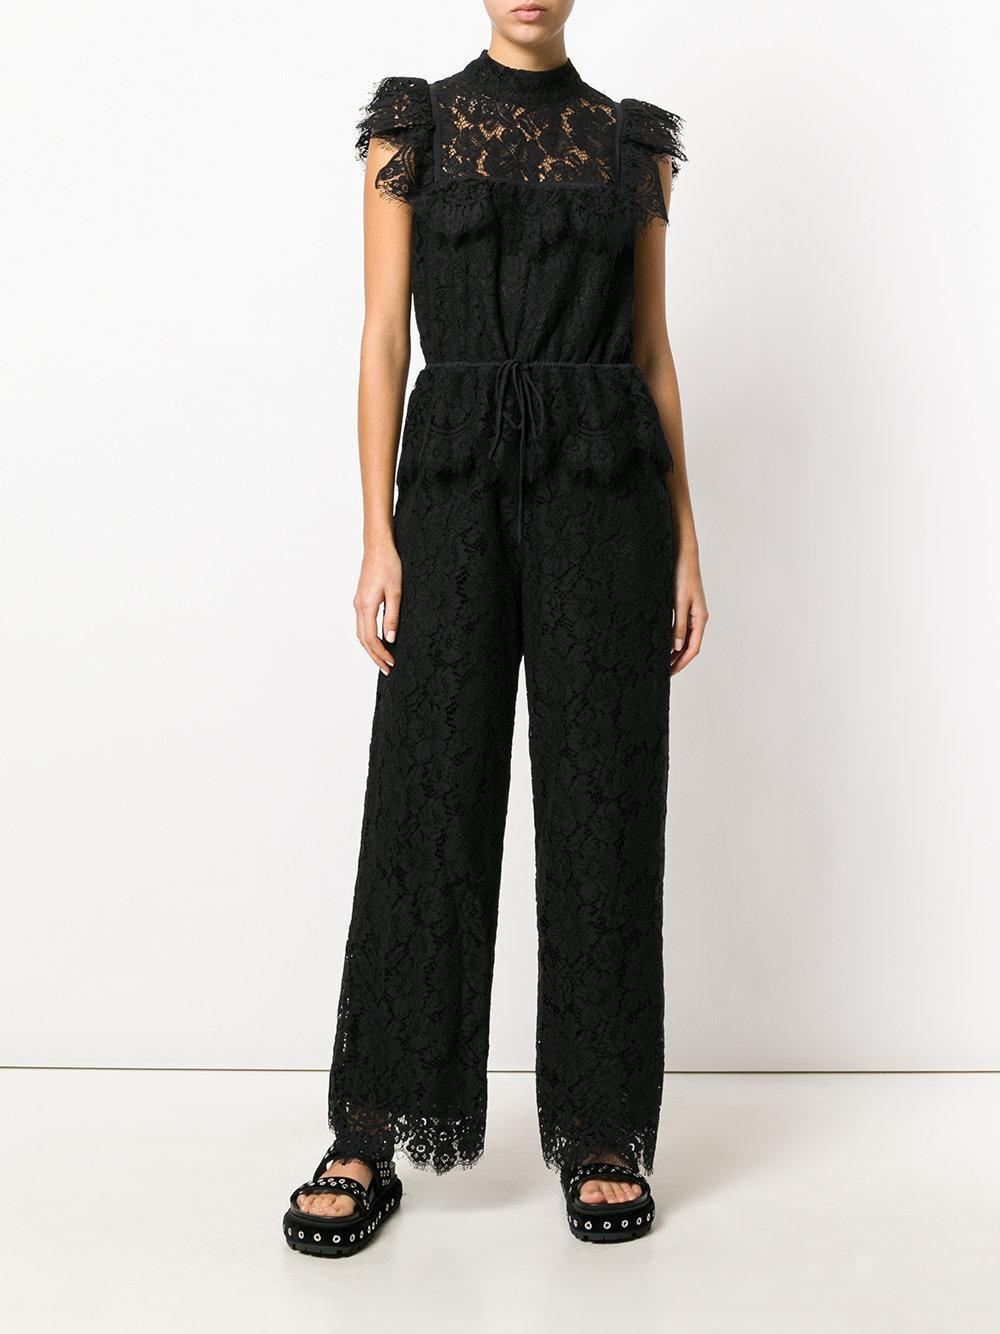 a7a82b0cf0c1 Ganni Jerome Lace Jumpsuit in Black - Lyst